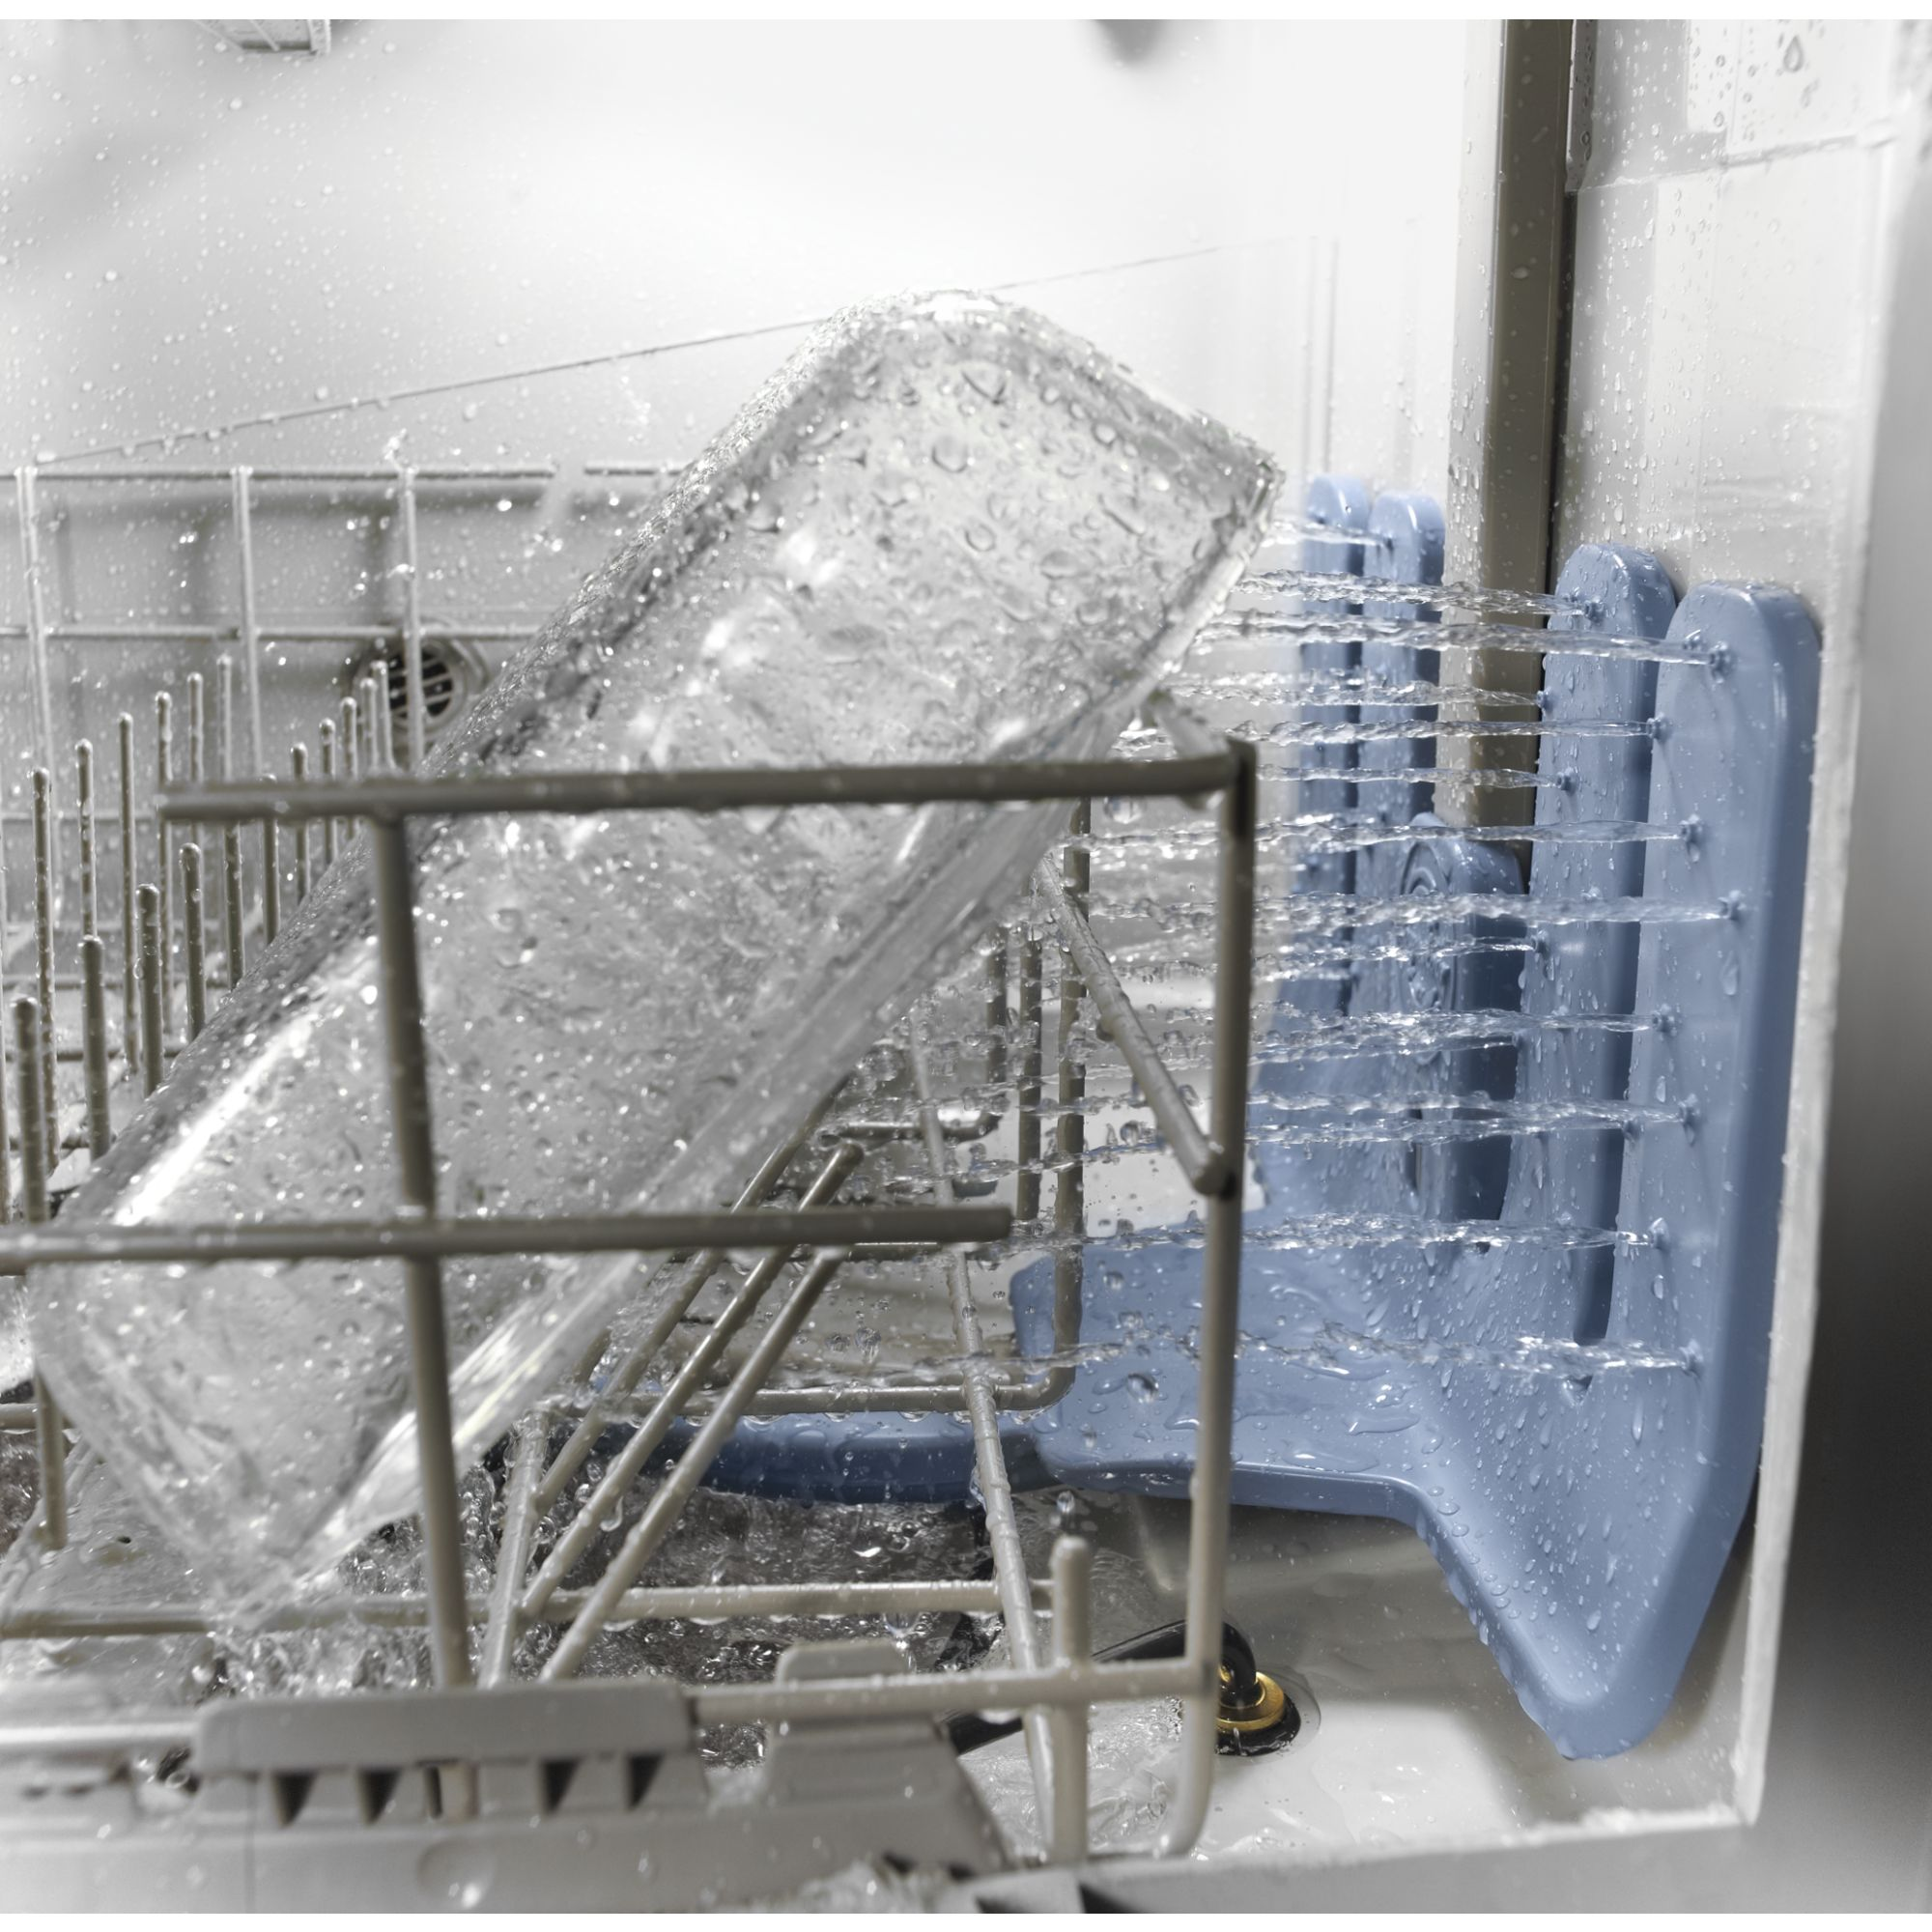 "Whirlpool 24"" Built-In Dishwasher w/ PowerScour™ Option - Black"